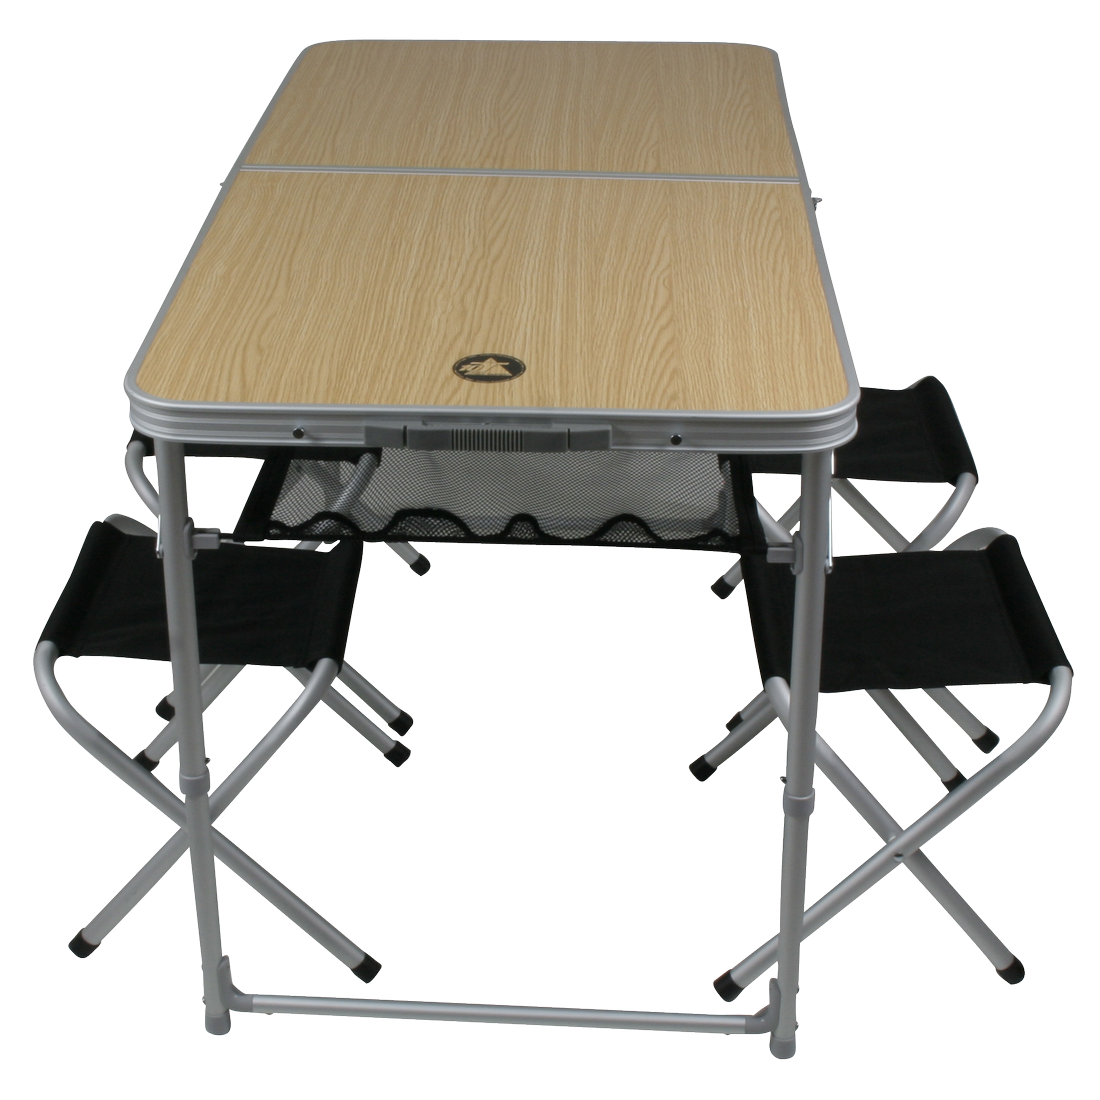 10t portable family alu campingtisch mit hocker f r 4 personen picknick sitzgruppe tisch hocker. Black Bedroom Furniture Sets. Home Design Ideas